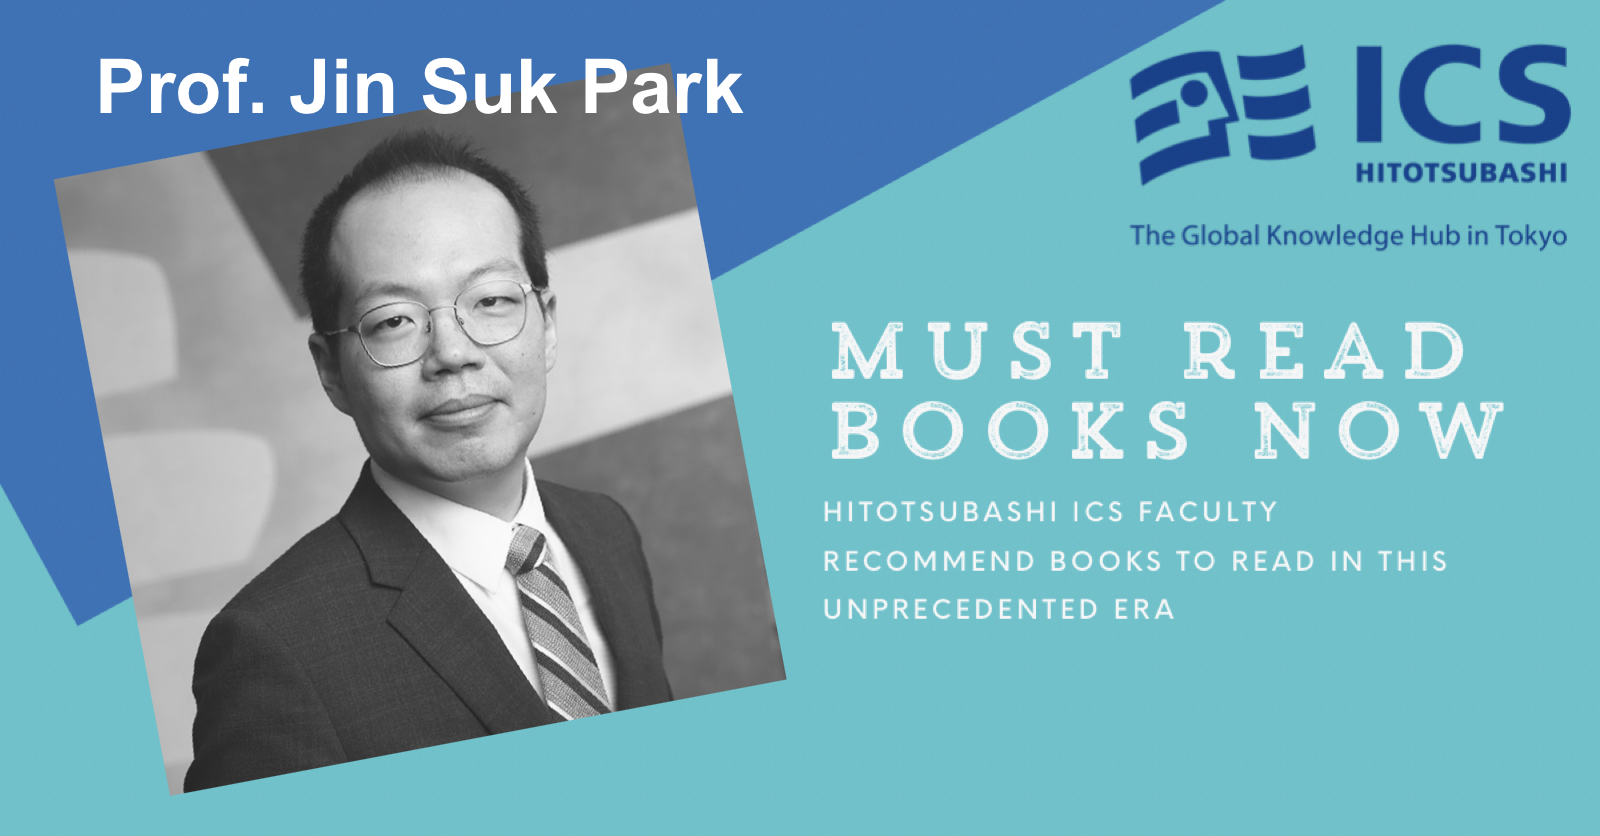 ProfessorJinSukPark_MBAJapan_MustRead